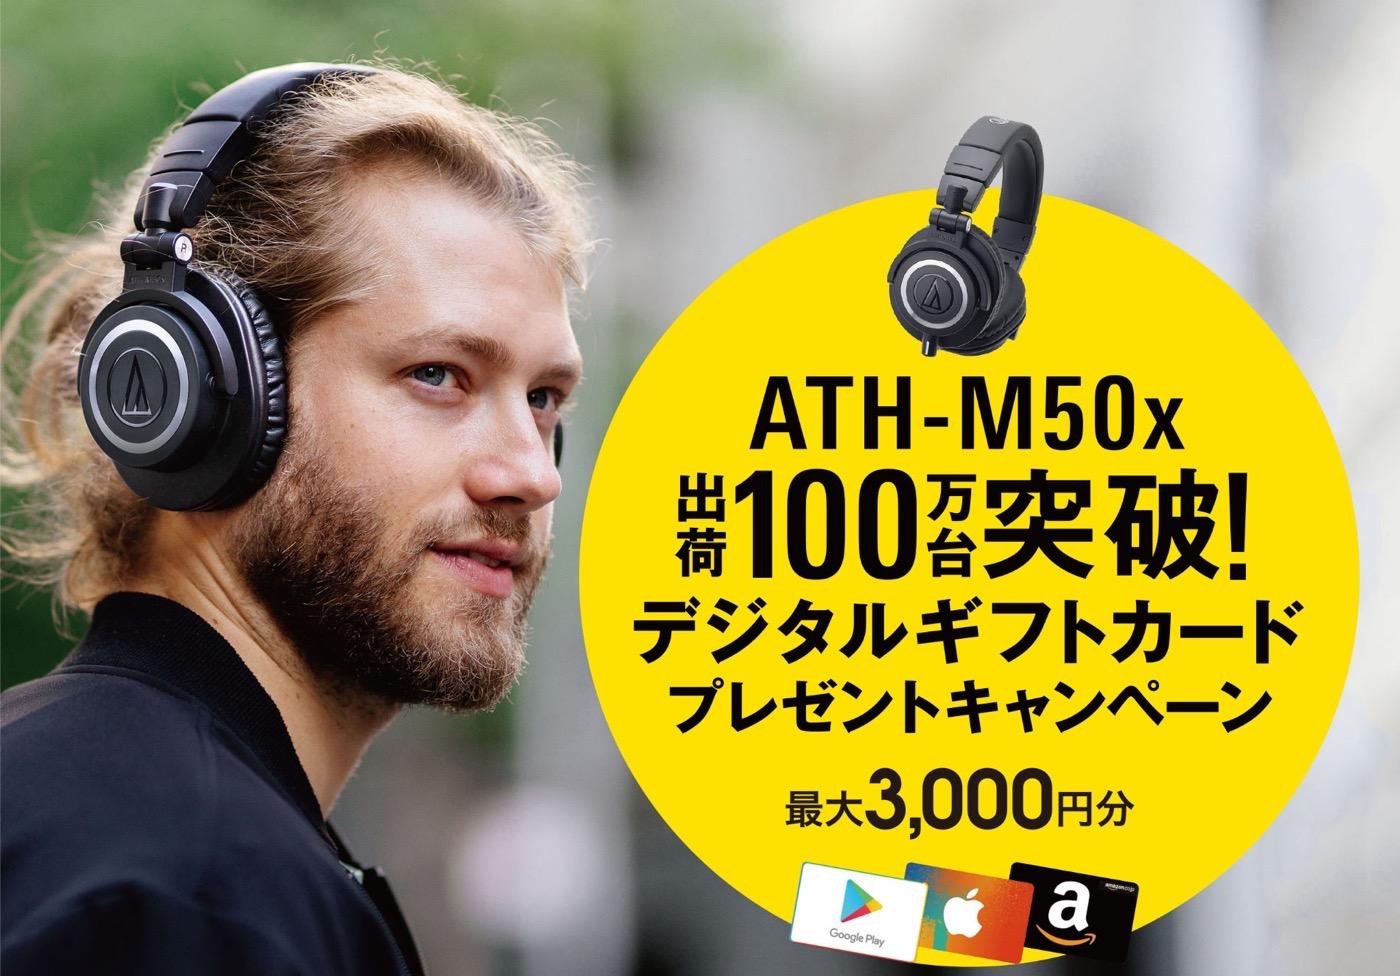 Audiotechnica ATHM50x camp 01